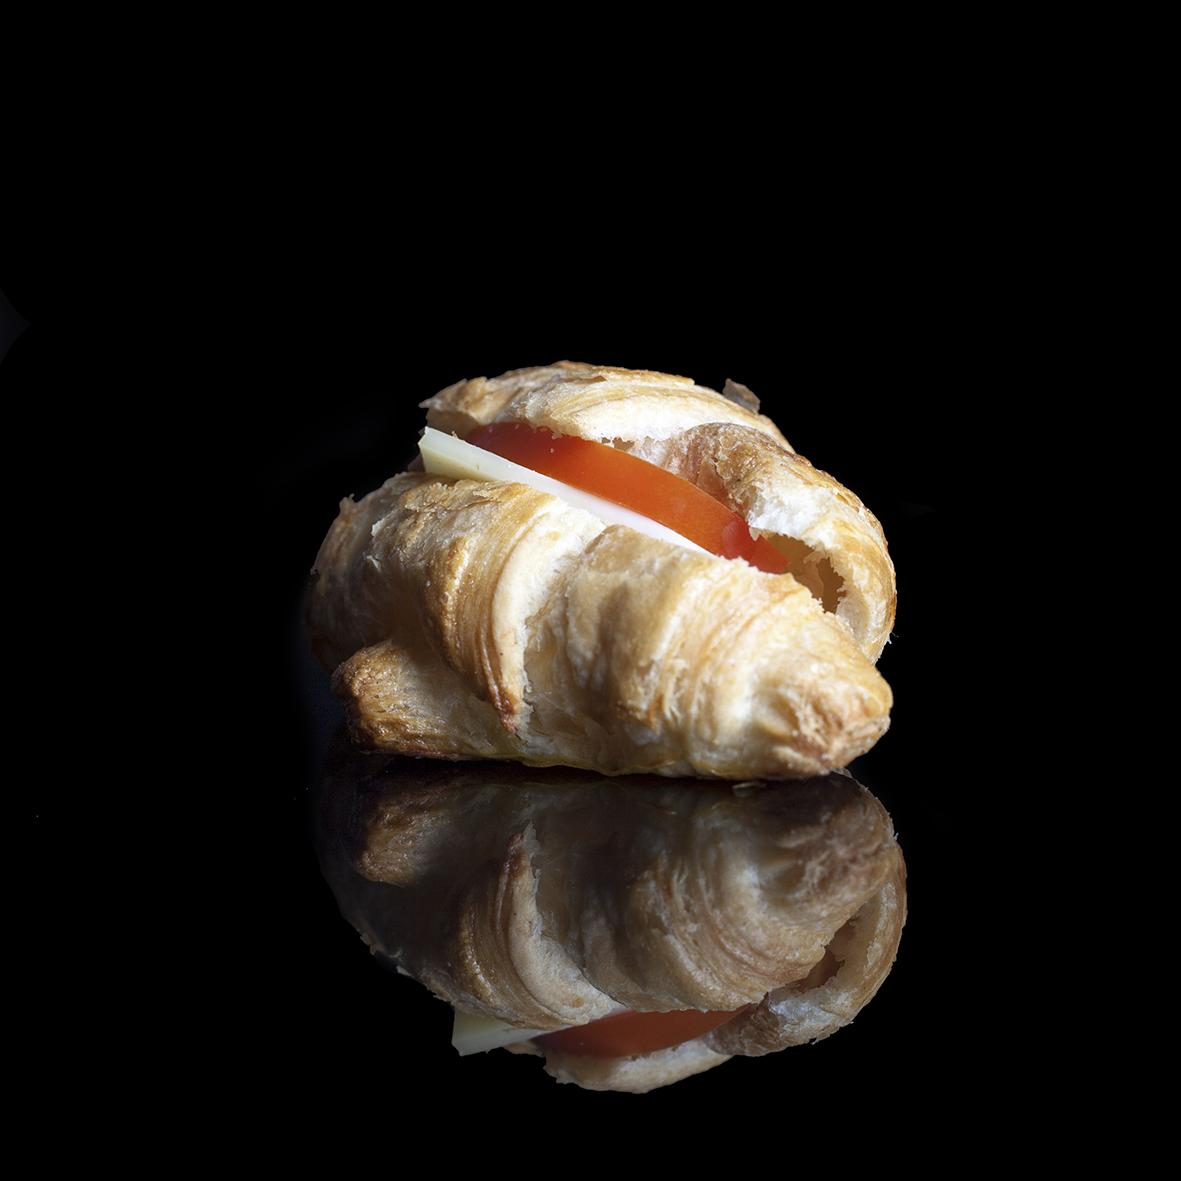 Mini Tomato & Cheese Croissant ($4)